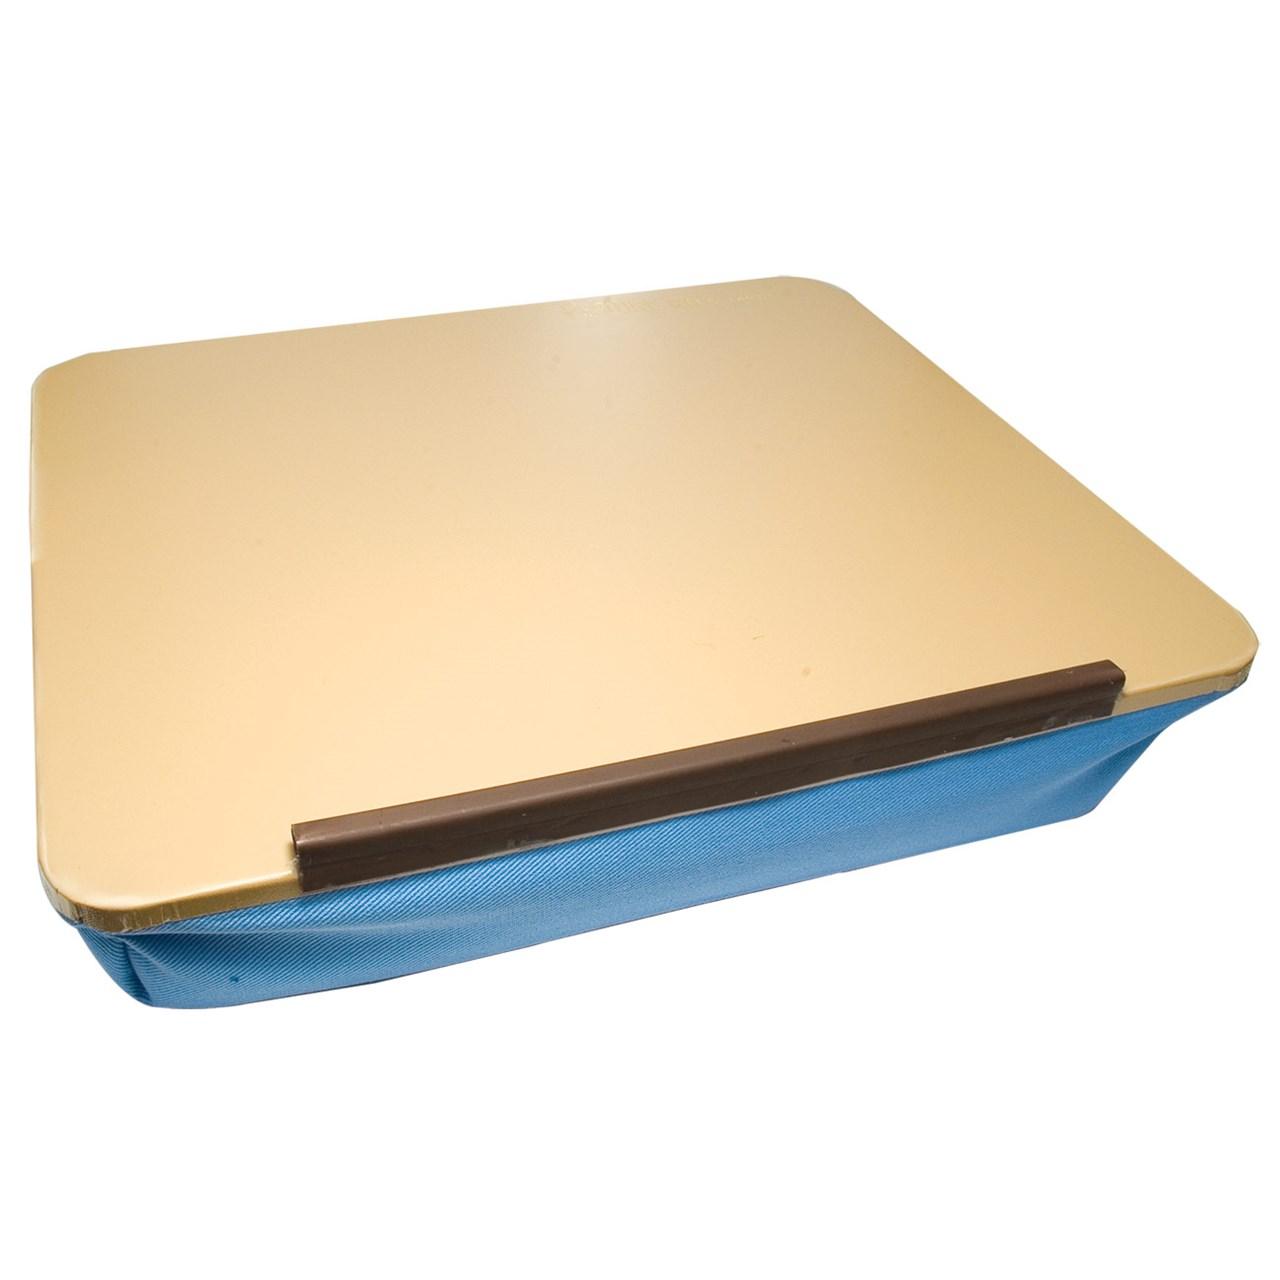 Maxiaids Posture Rite Lap Desk